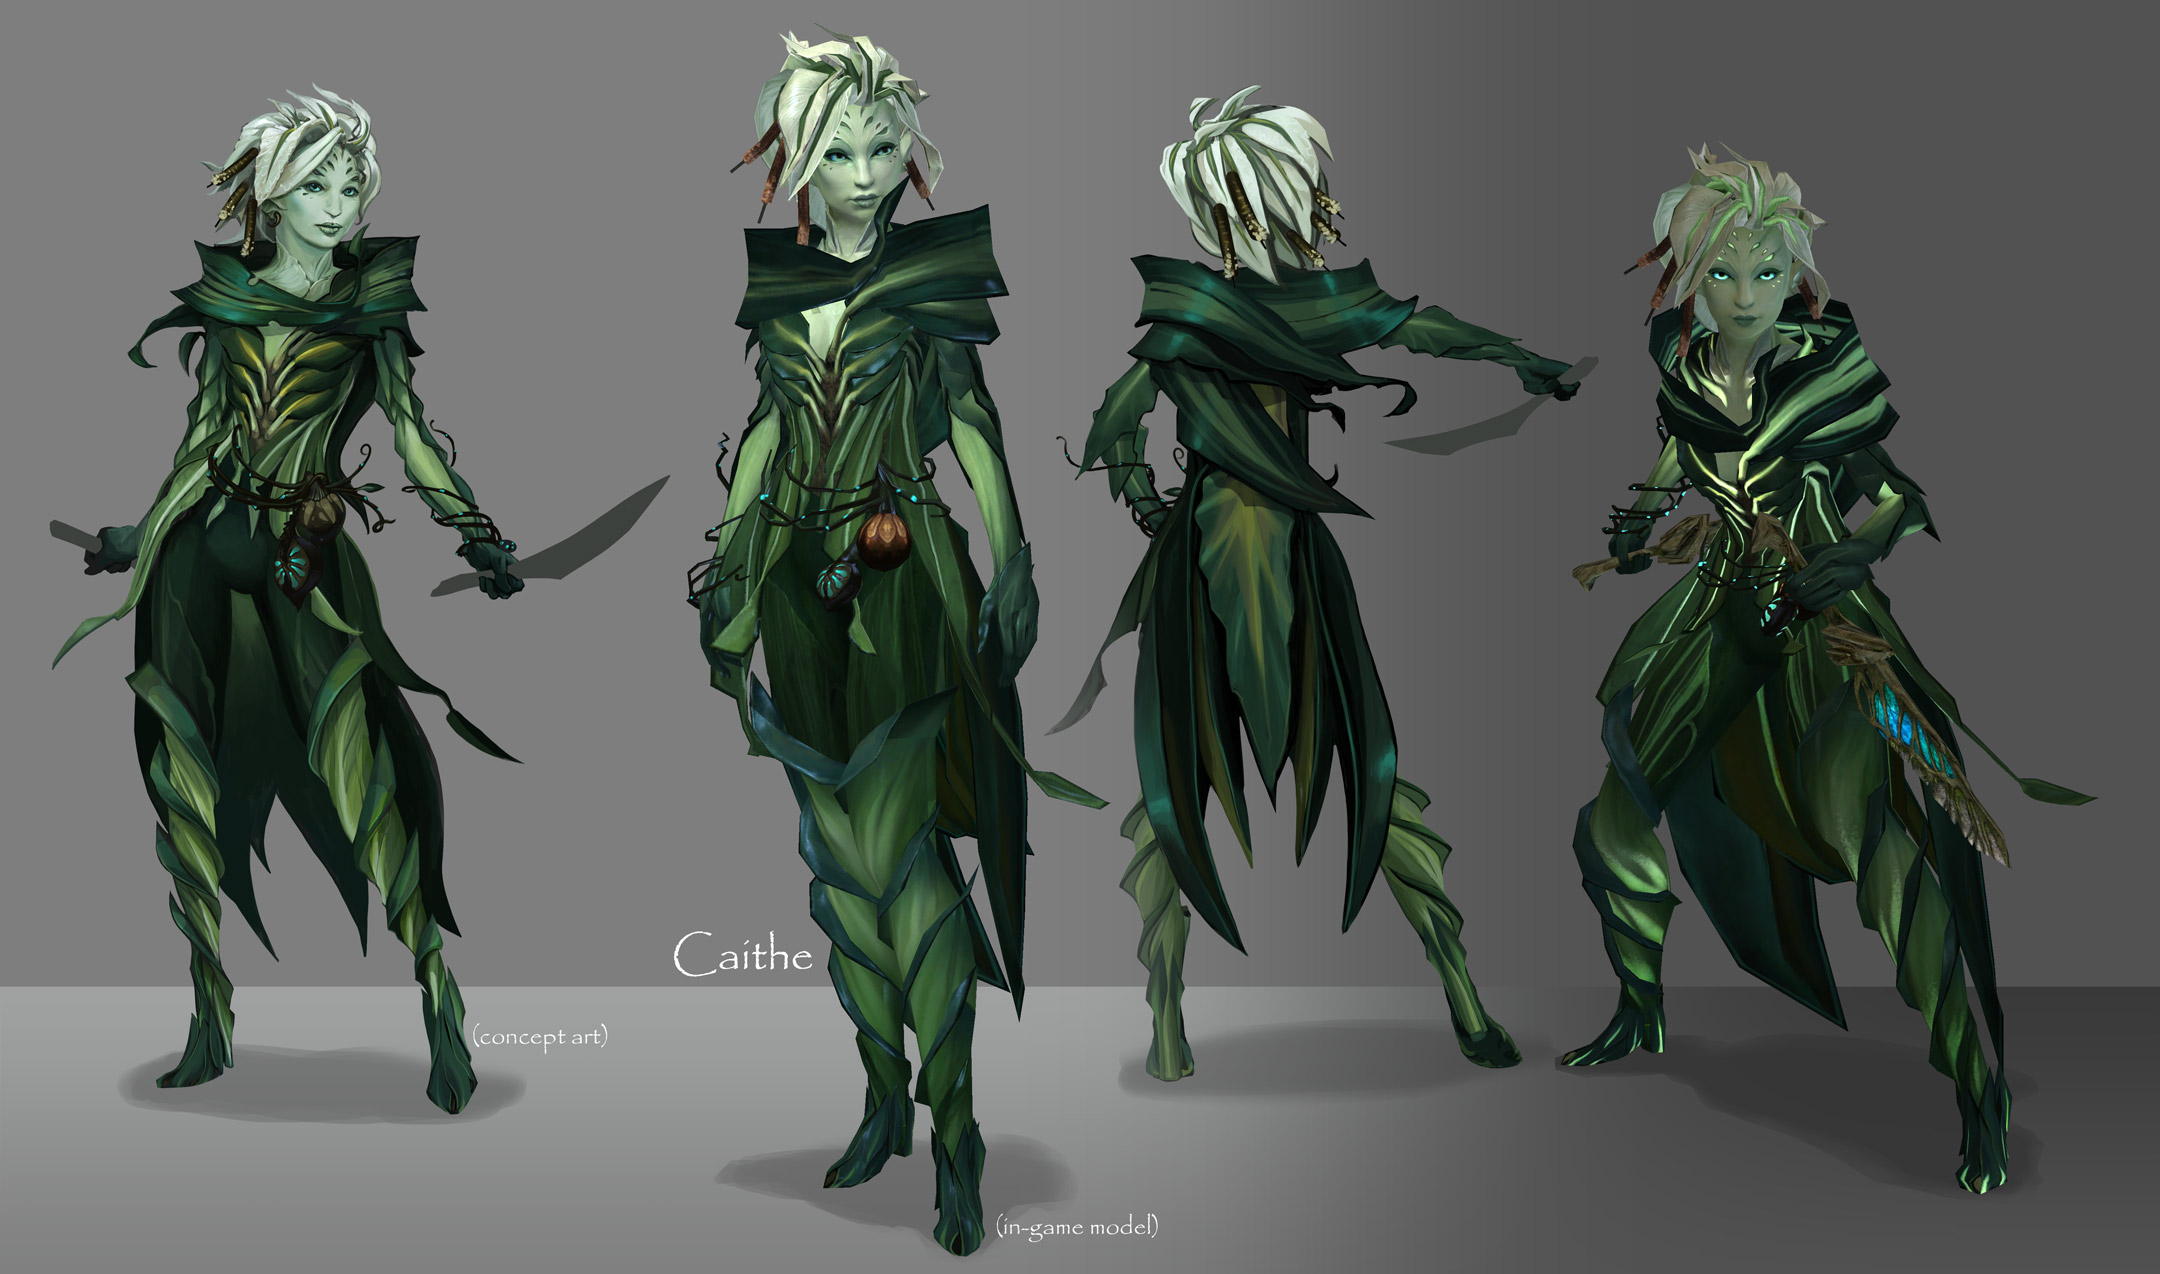 Guild wars 2 gw2 darkened desires gw2 fashion - Caithe Looks Fantastic